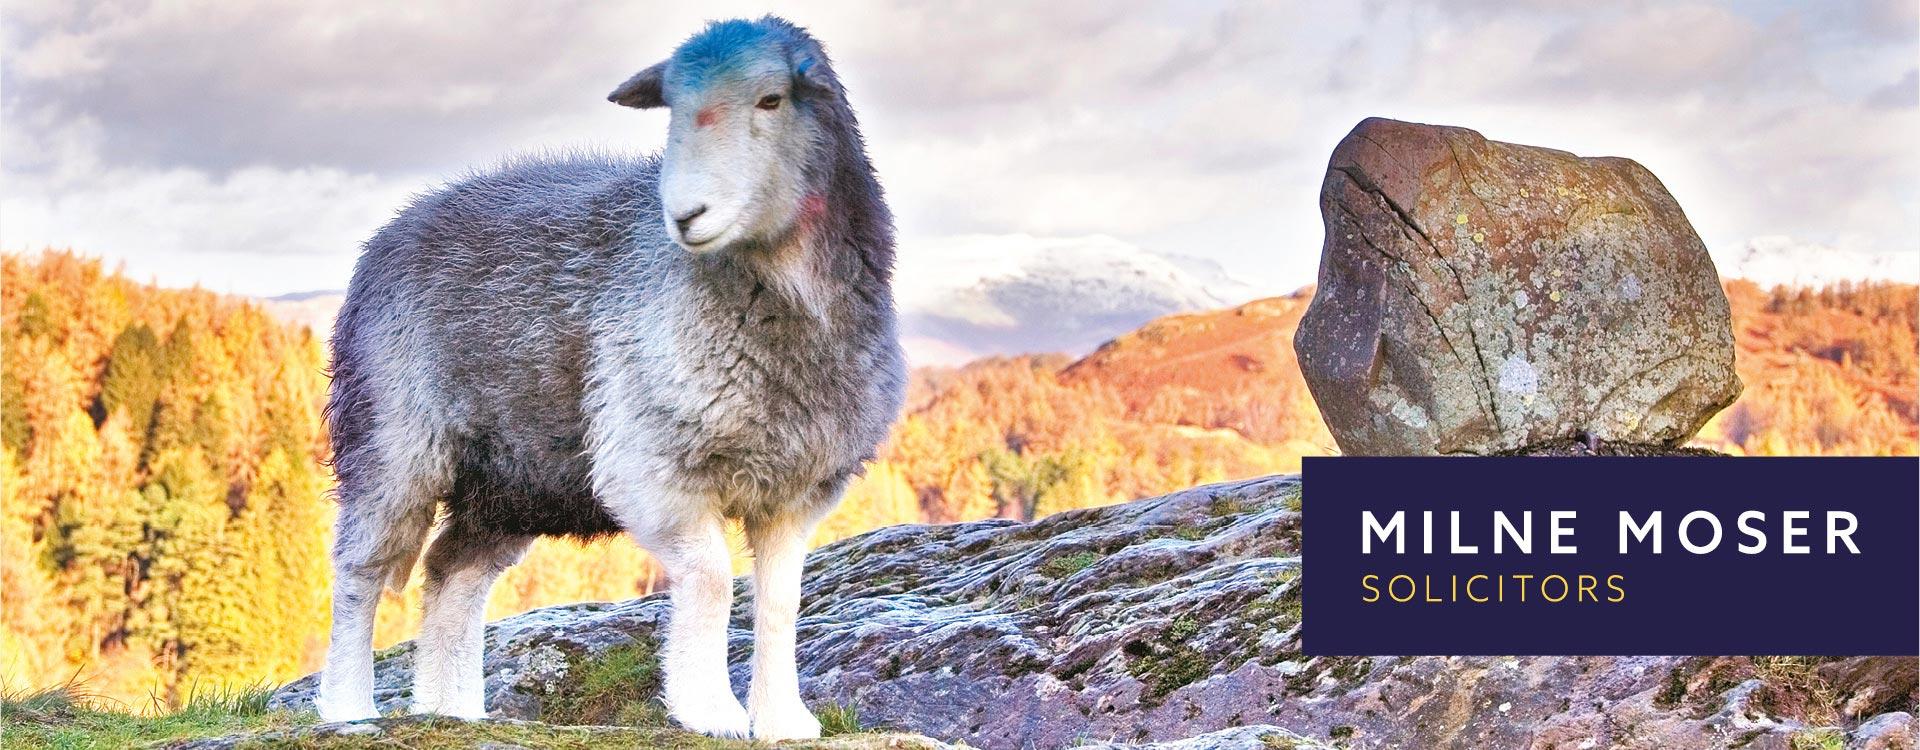 Milne Moser Solicitors Jon Allison Herdwick Sheep